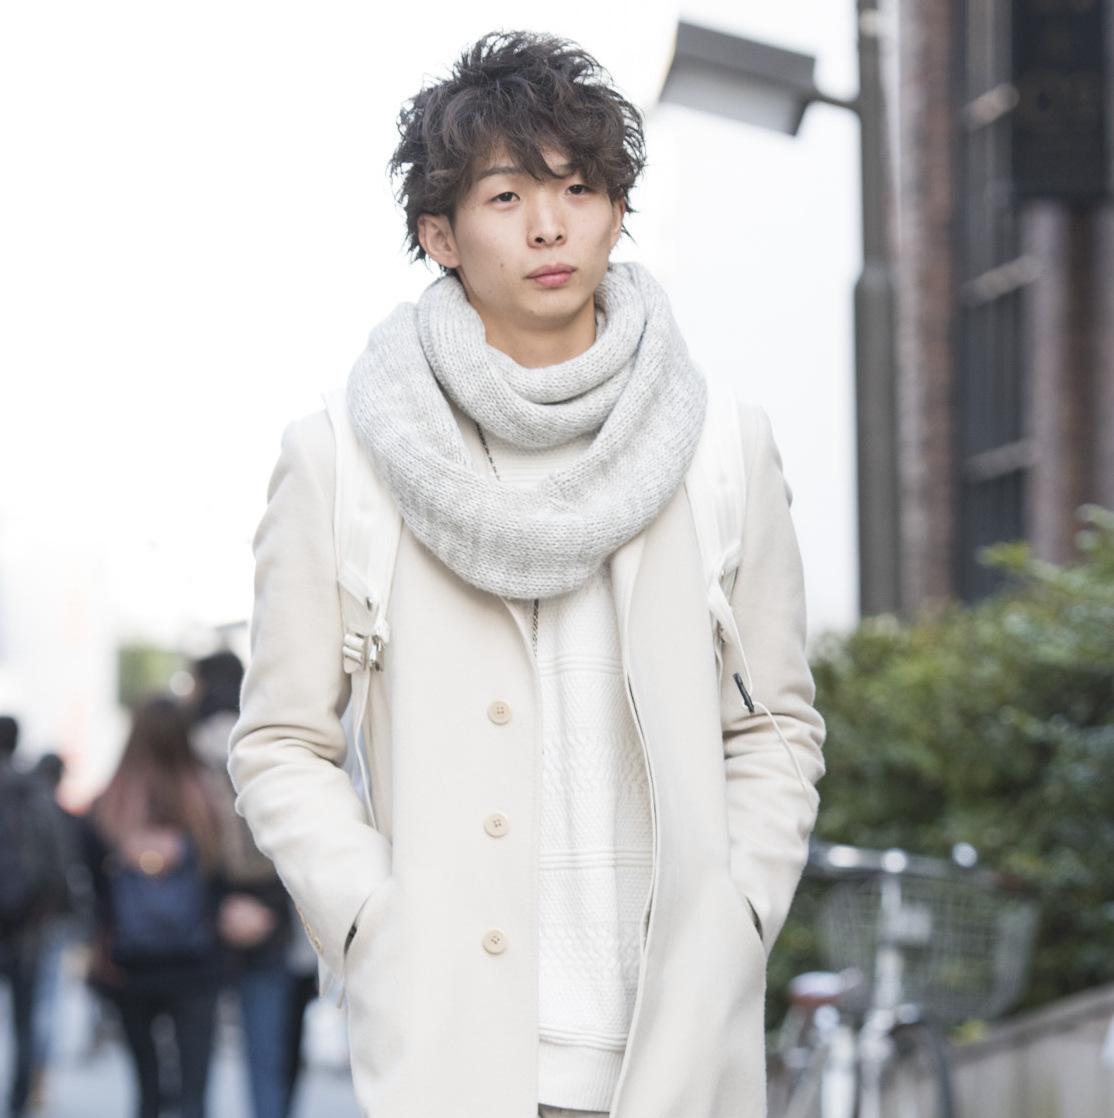 【SNAP JACK】冬のホワイトコーデのお手本に!!西帯野拓斗くん・飲食業